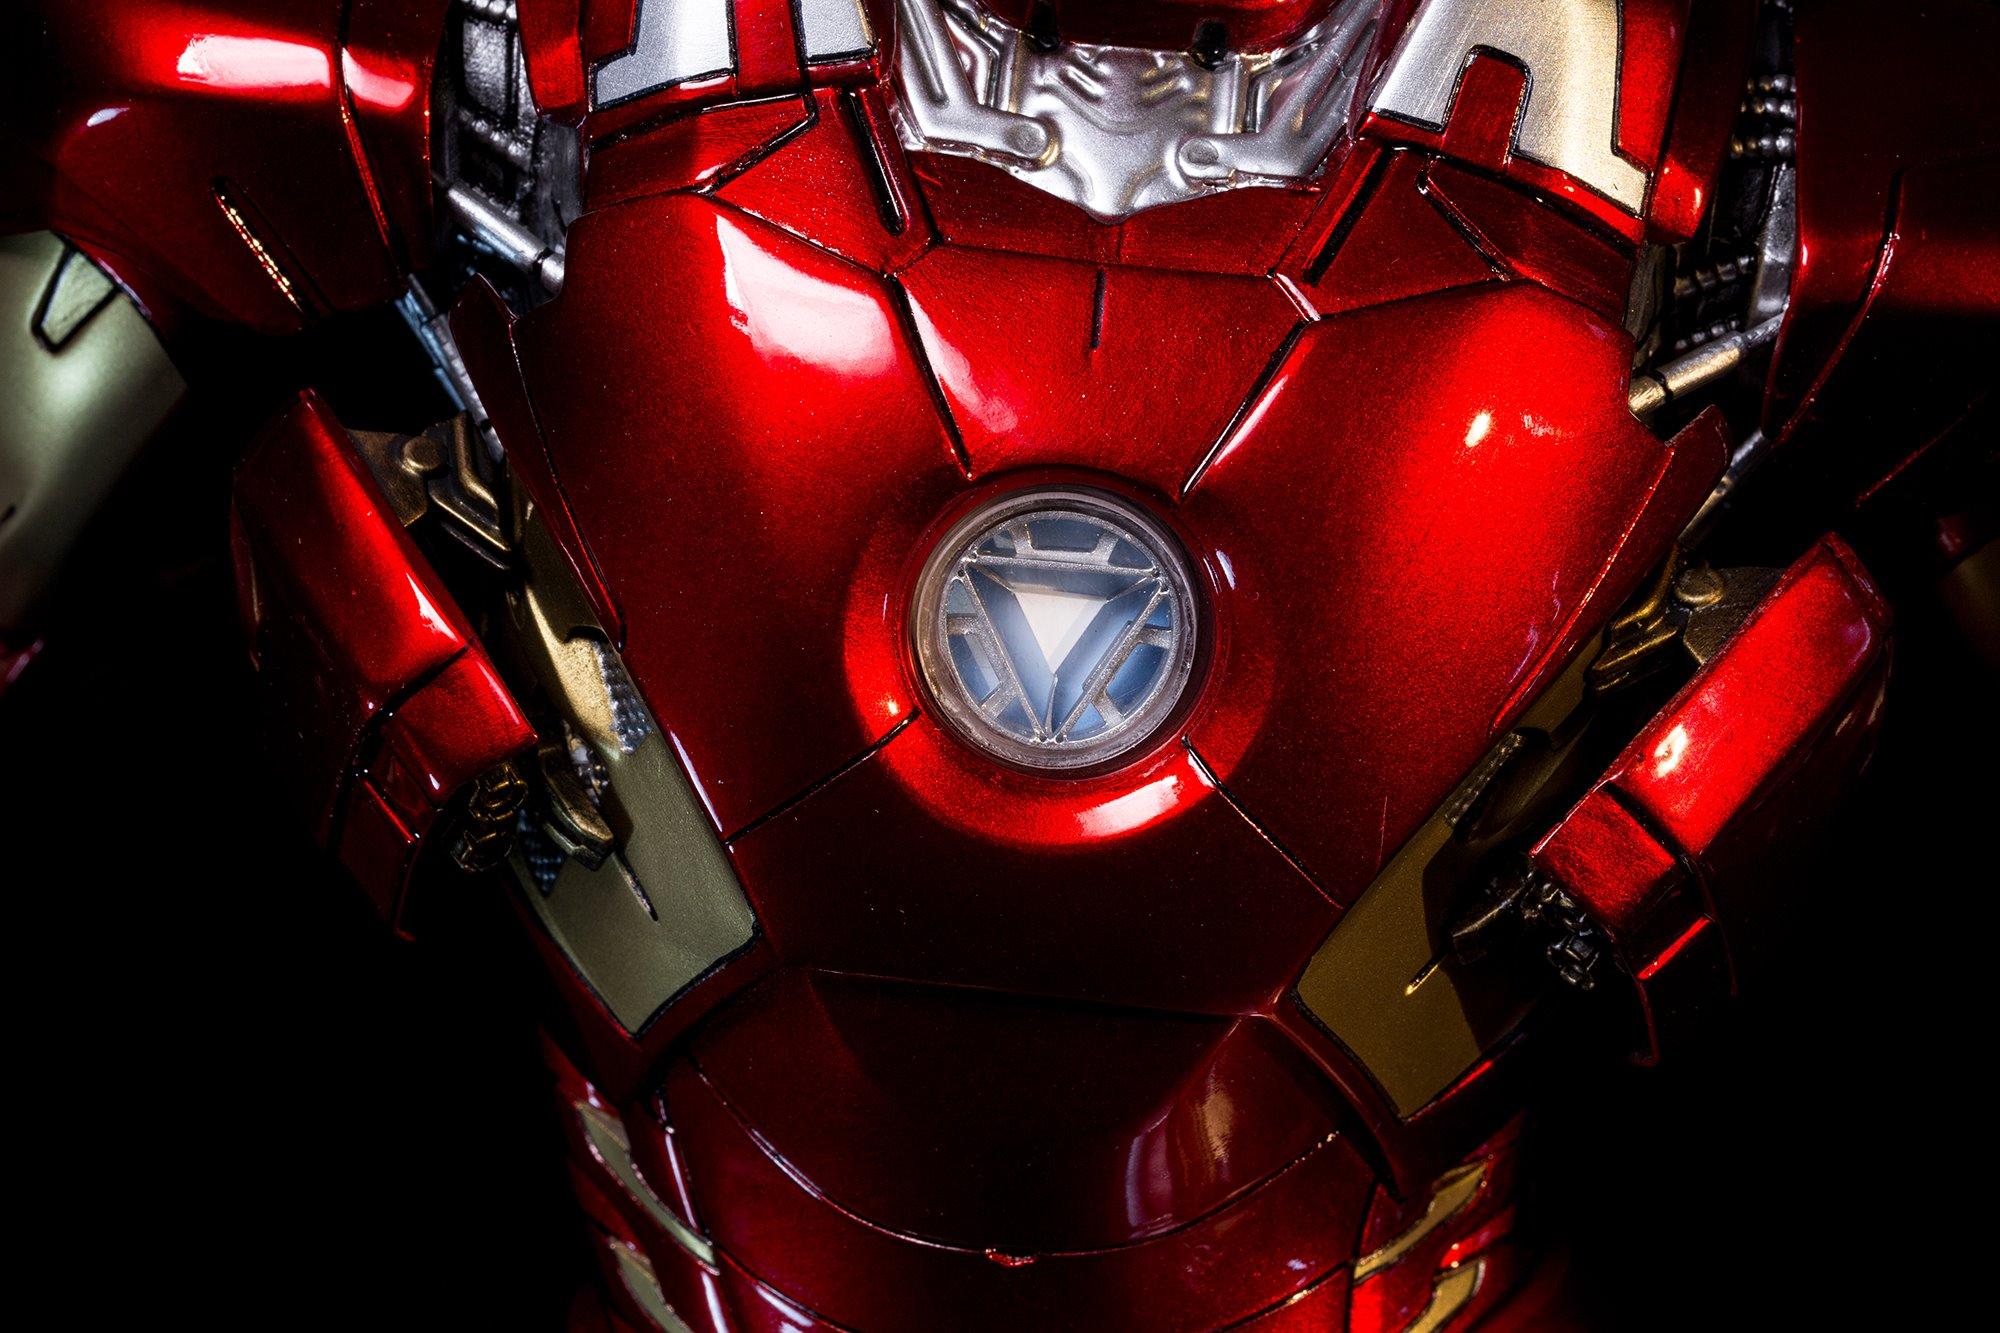 Premium Collectibles : Iron man MK VII - Page 2 6193491046545914035867431953541426971507292613866o